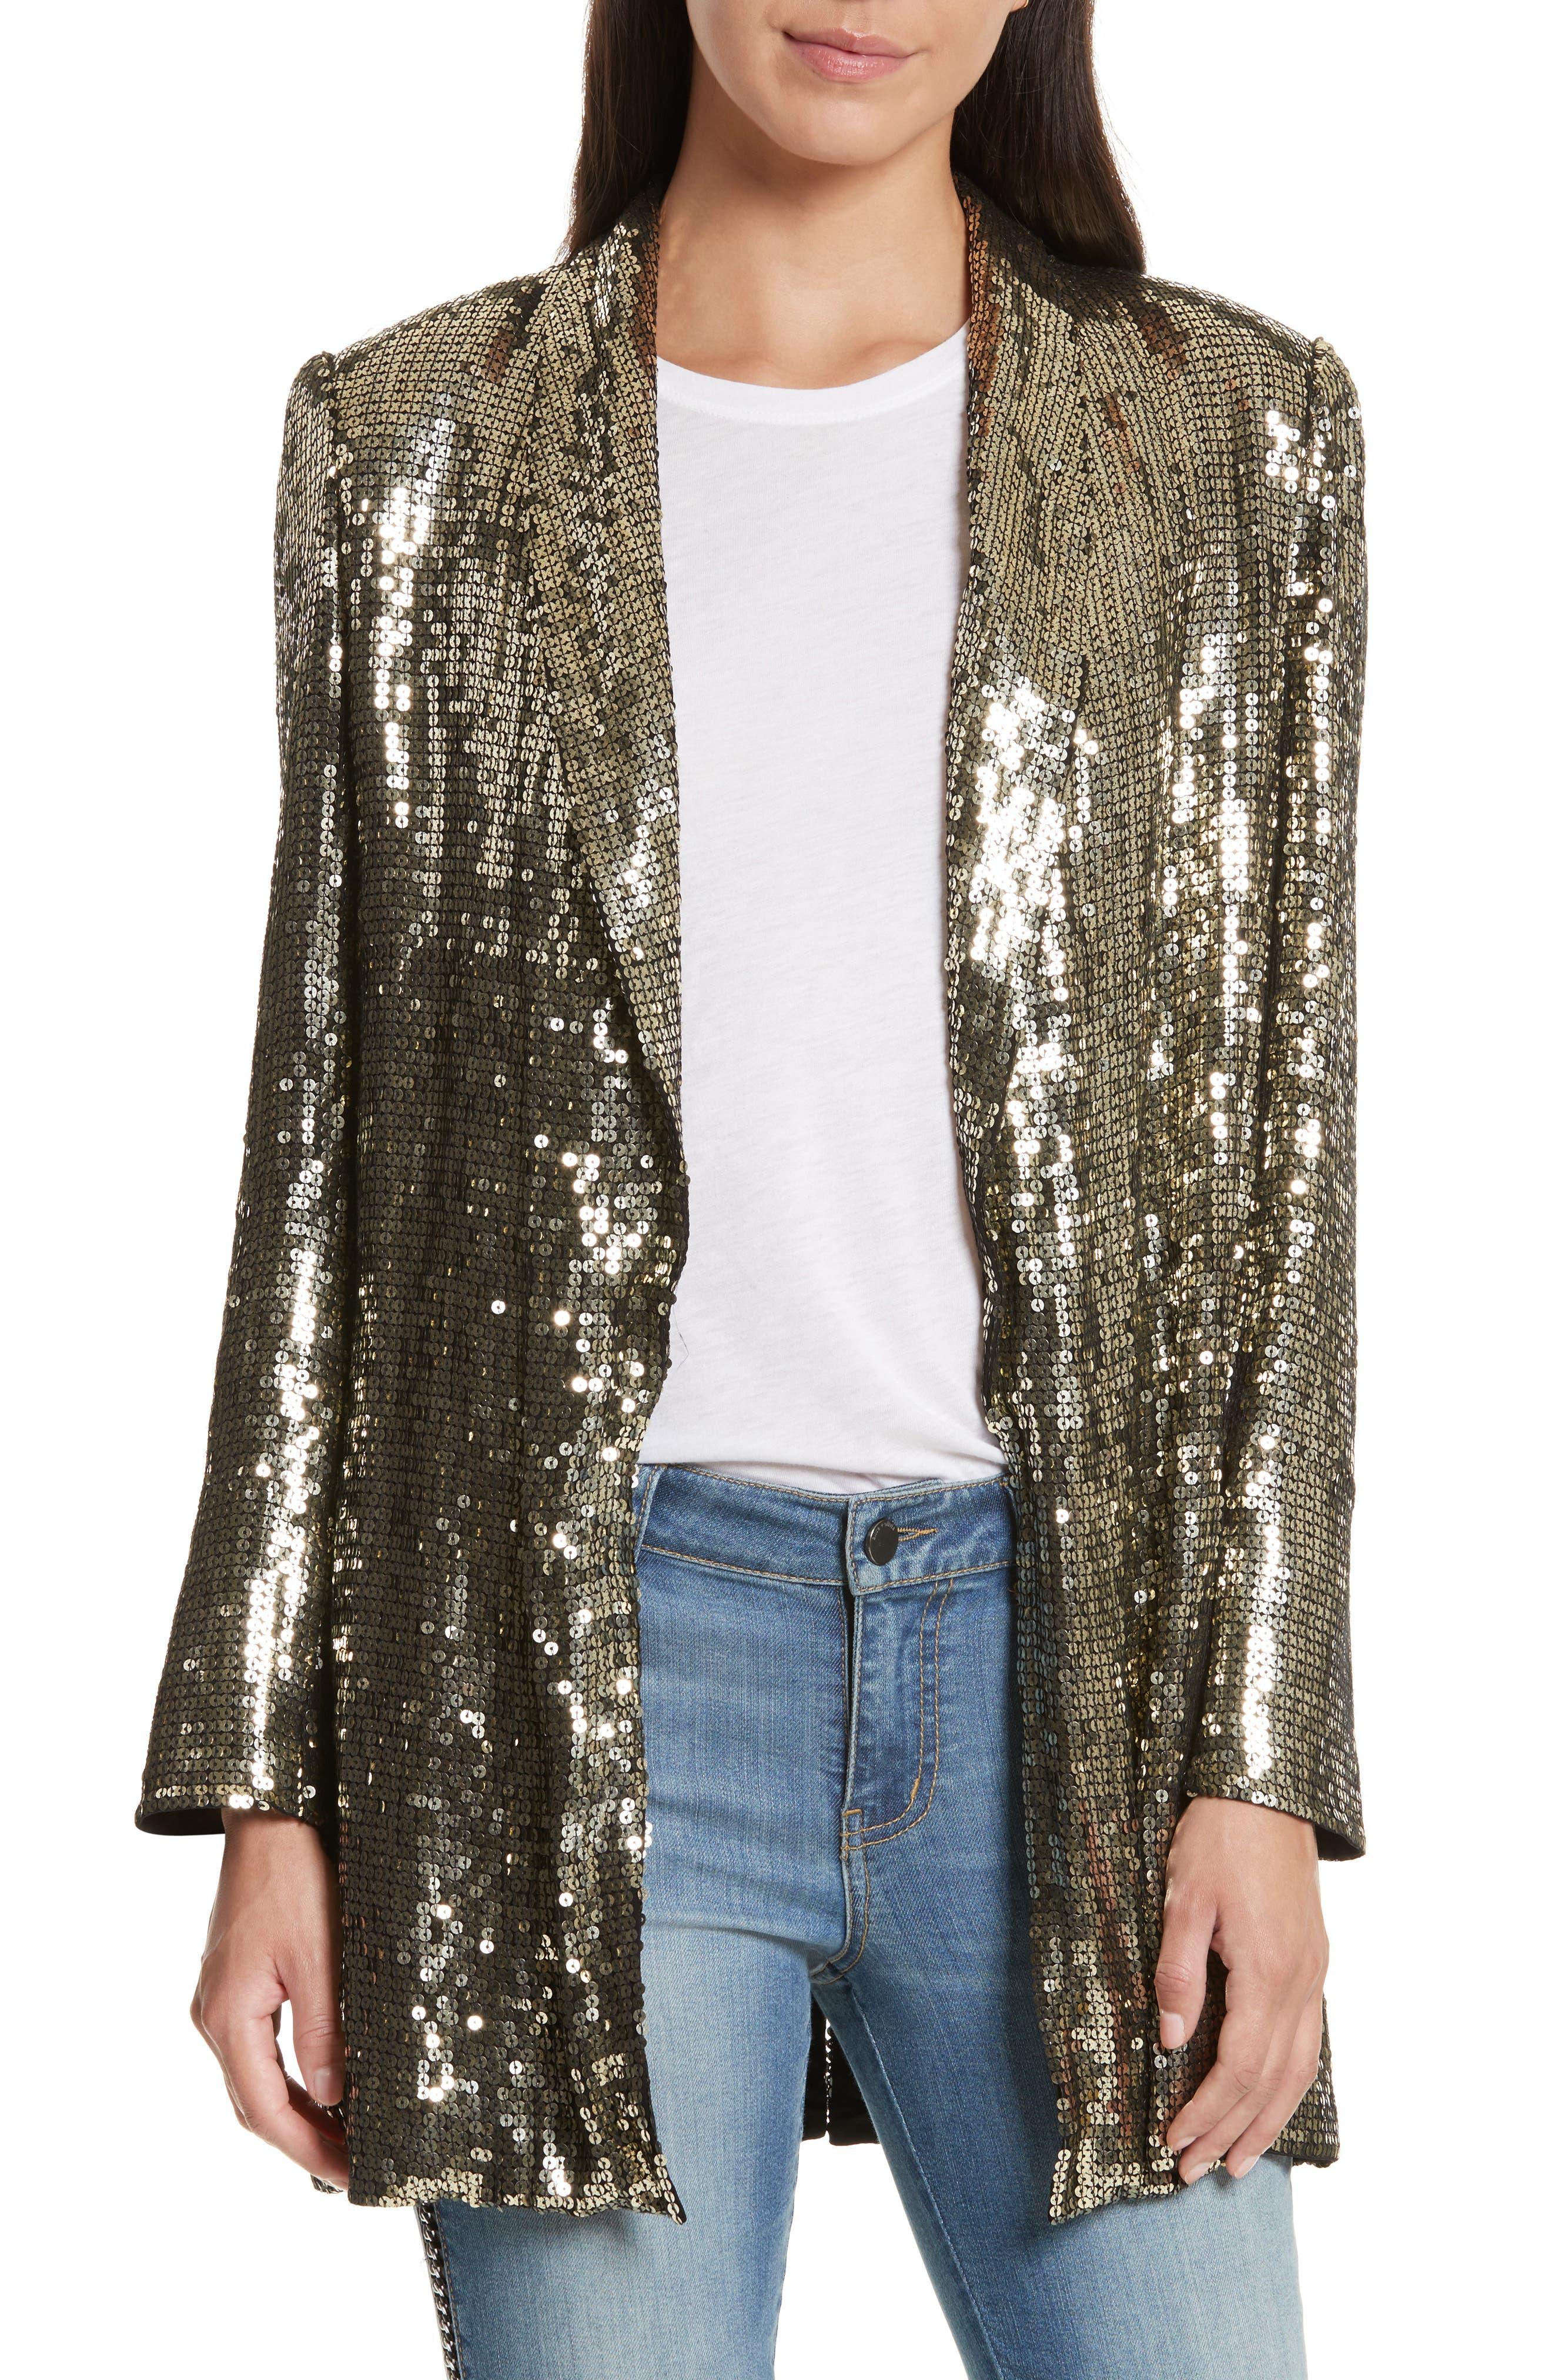 Main Image - Alice + Olivia Jace Sequin Embellished Blazer